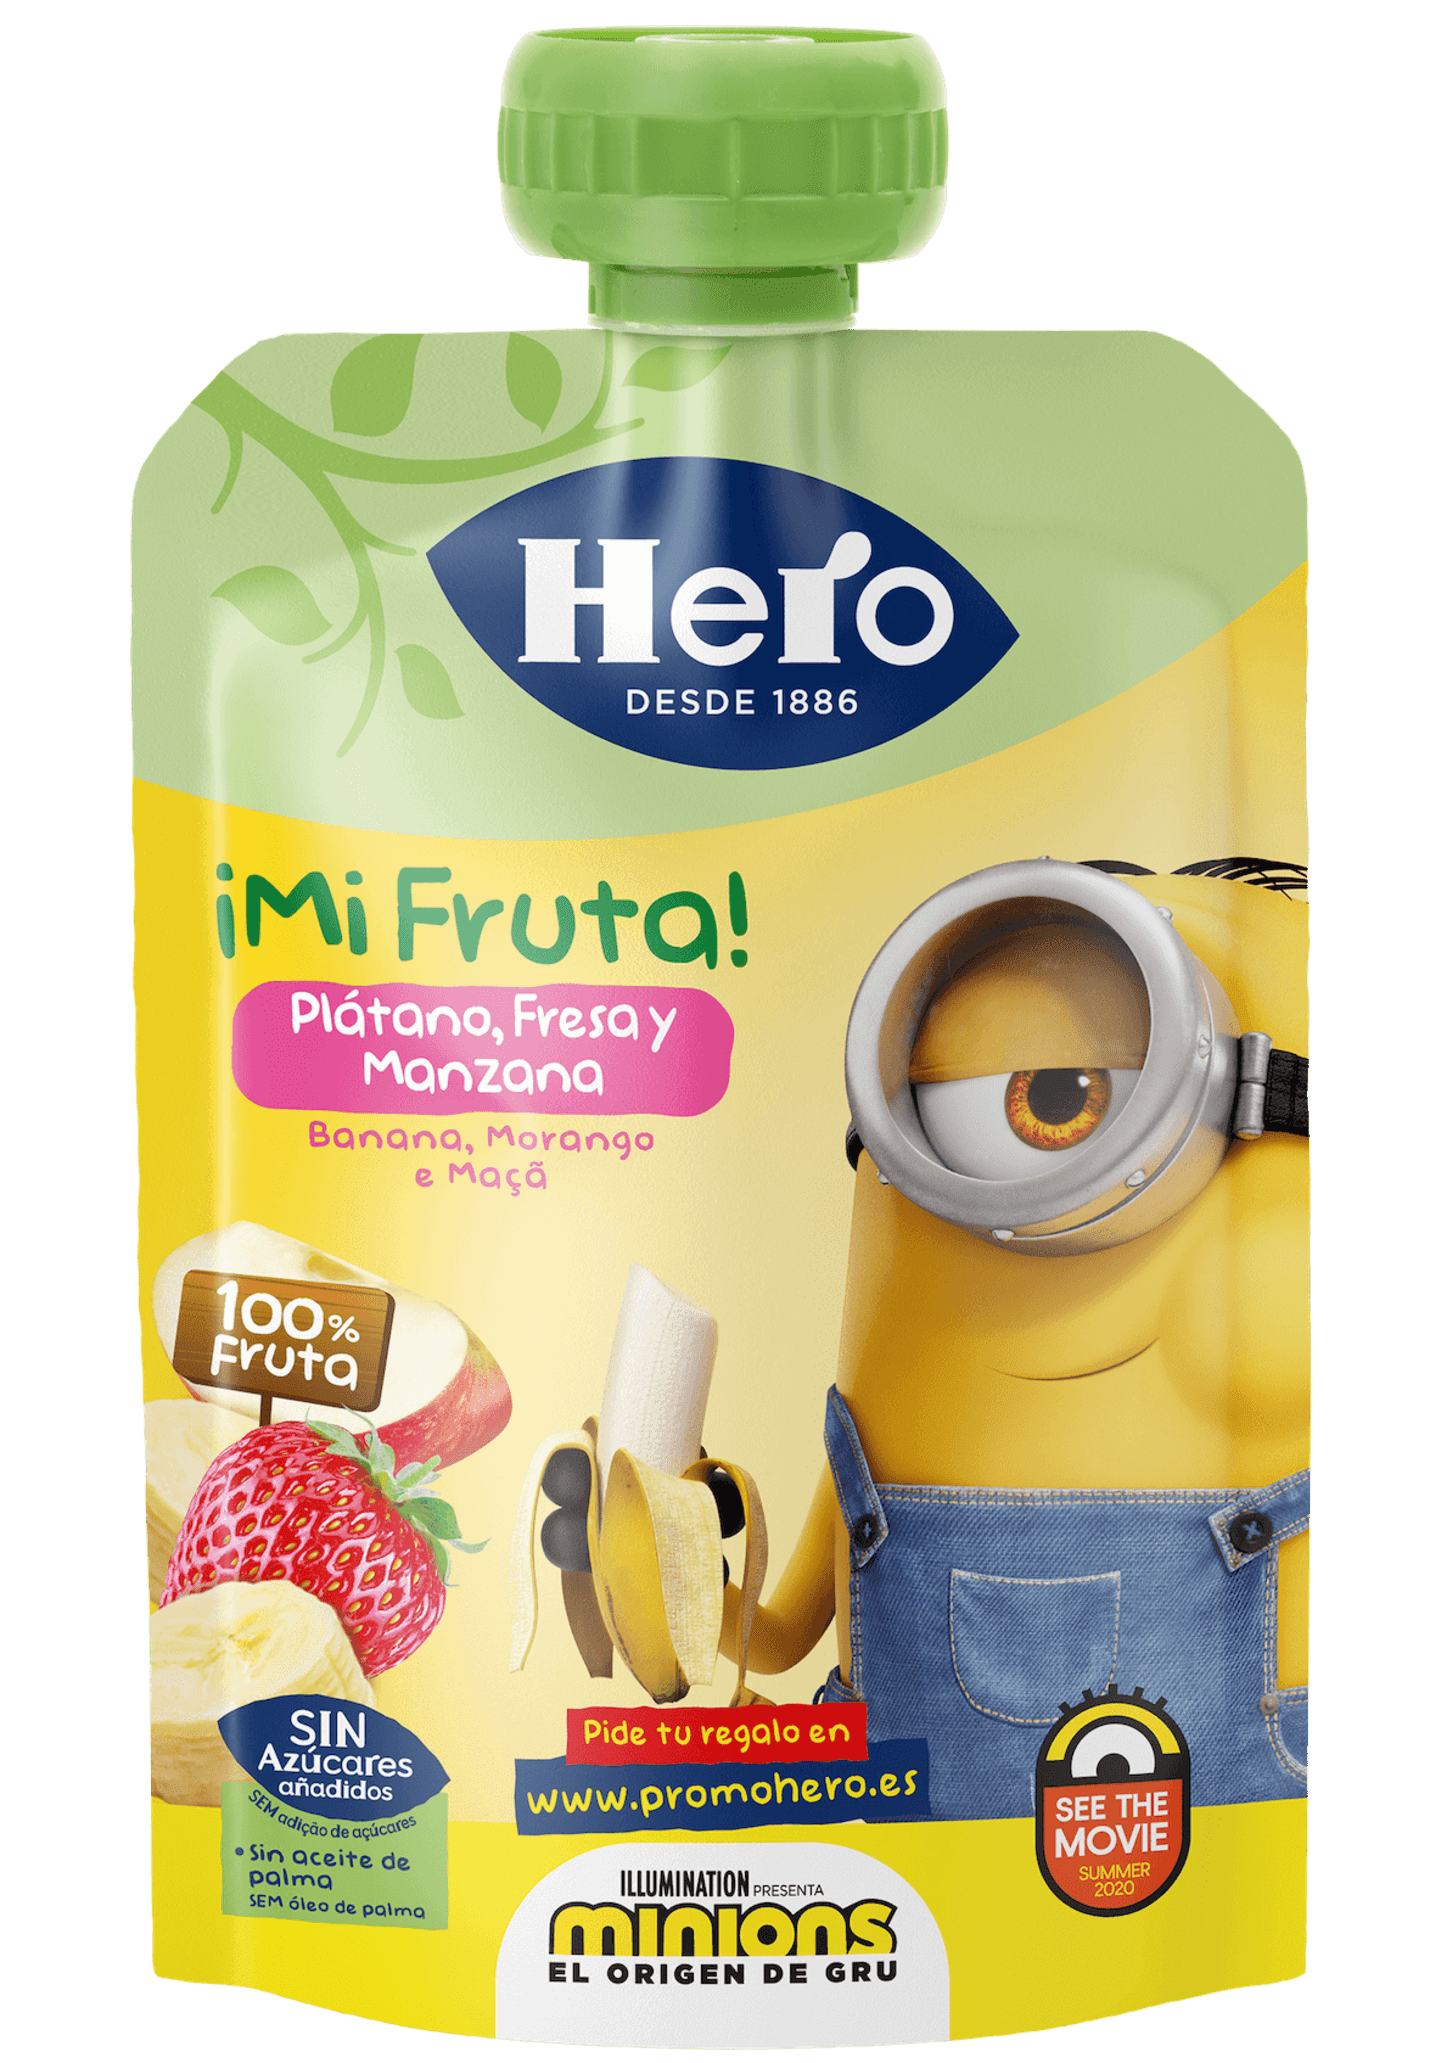 Saqueta Minions Banana, Morango e Maçã